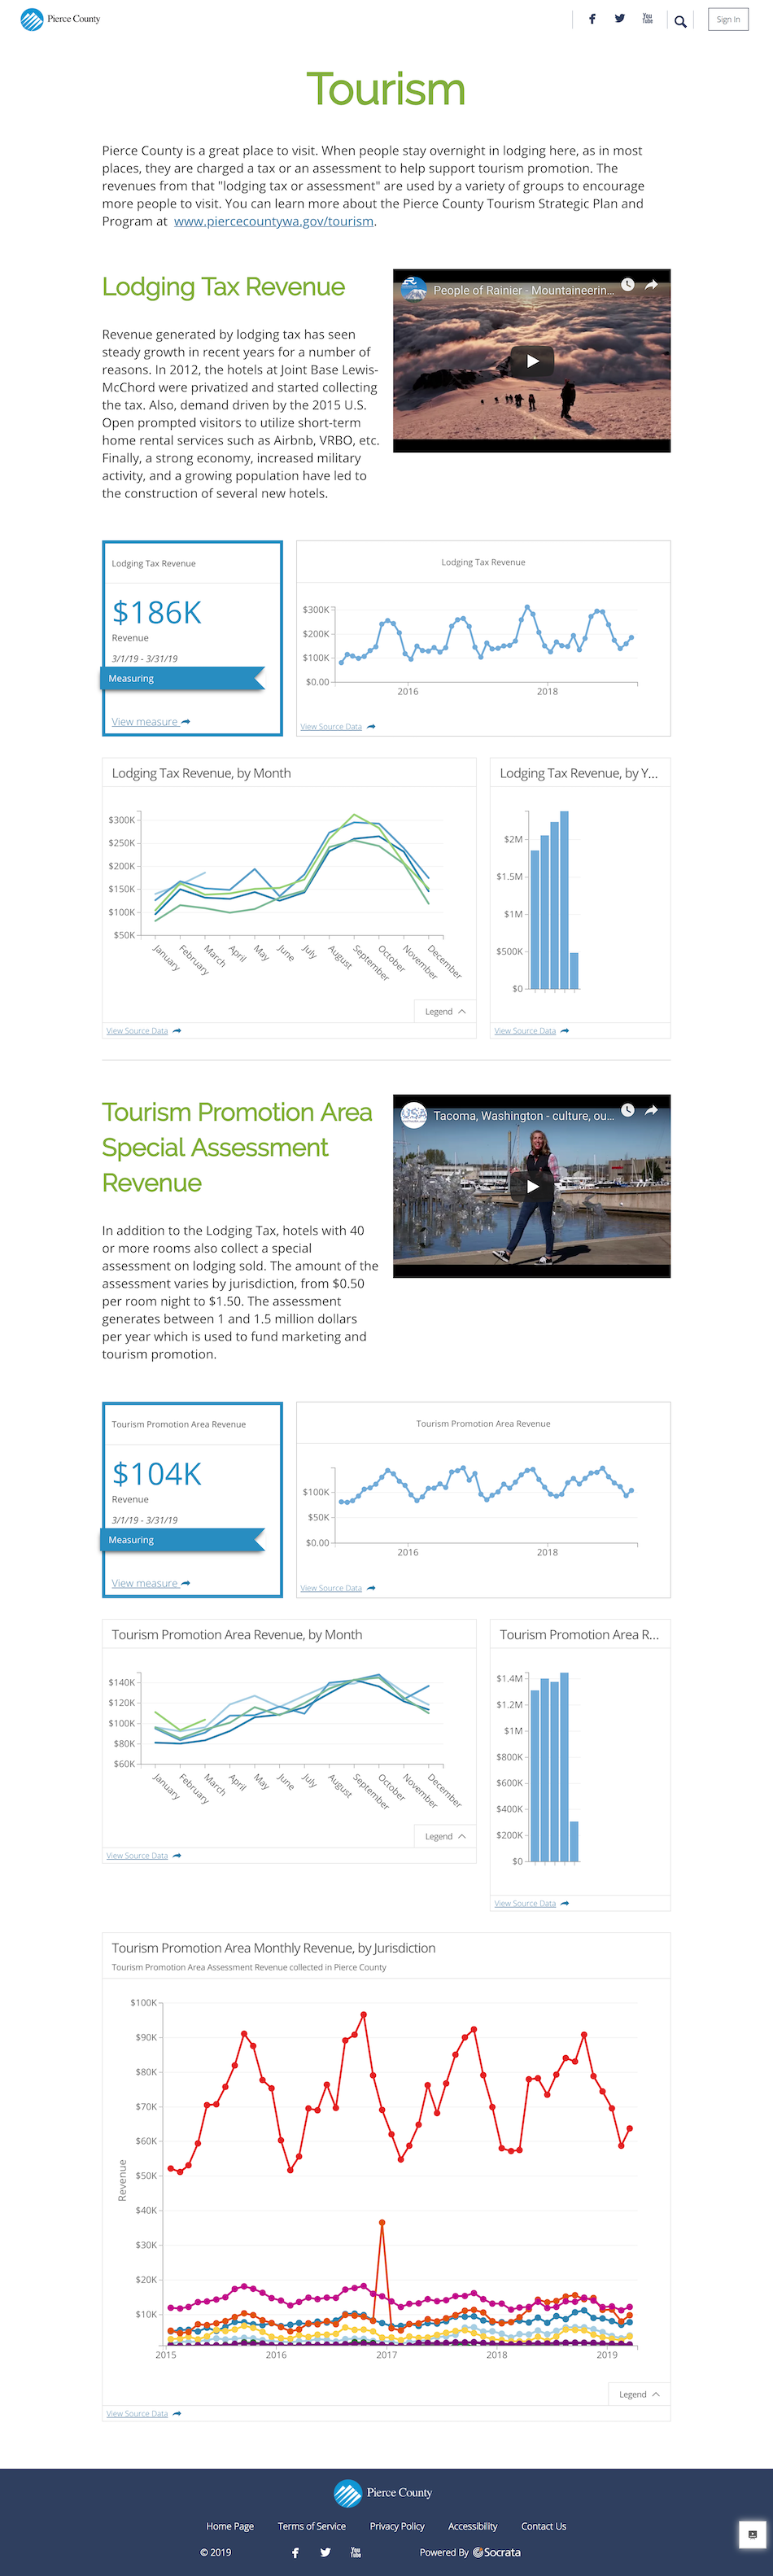 PierceCounty_Tourism report.png